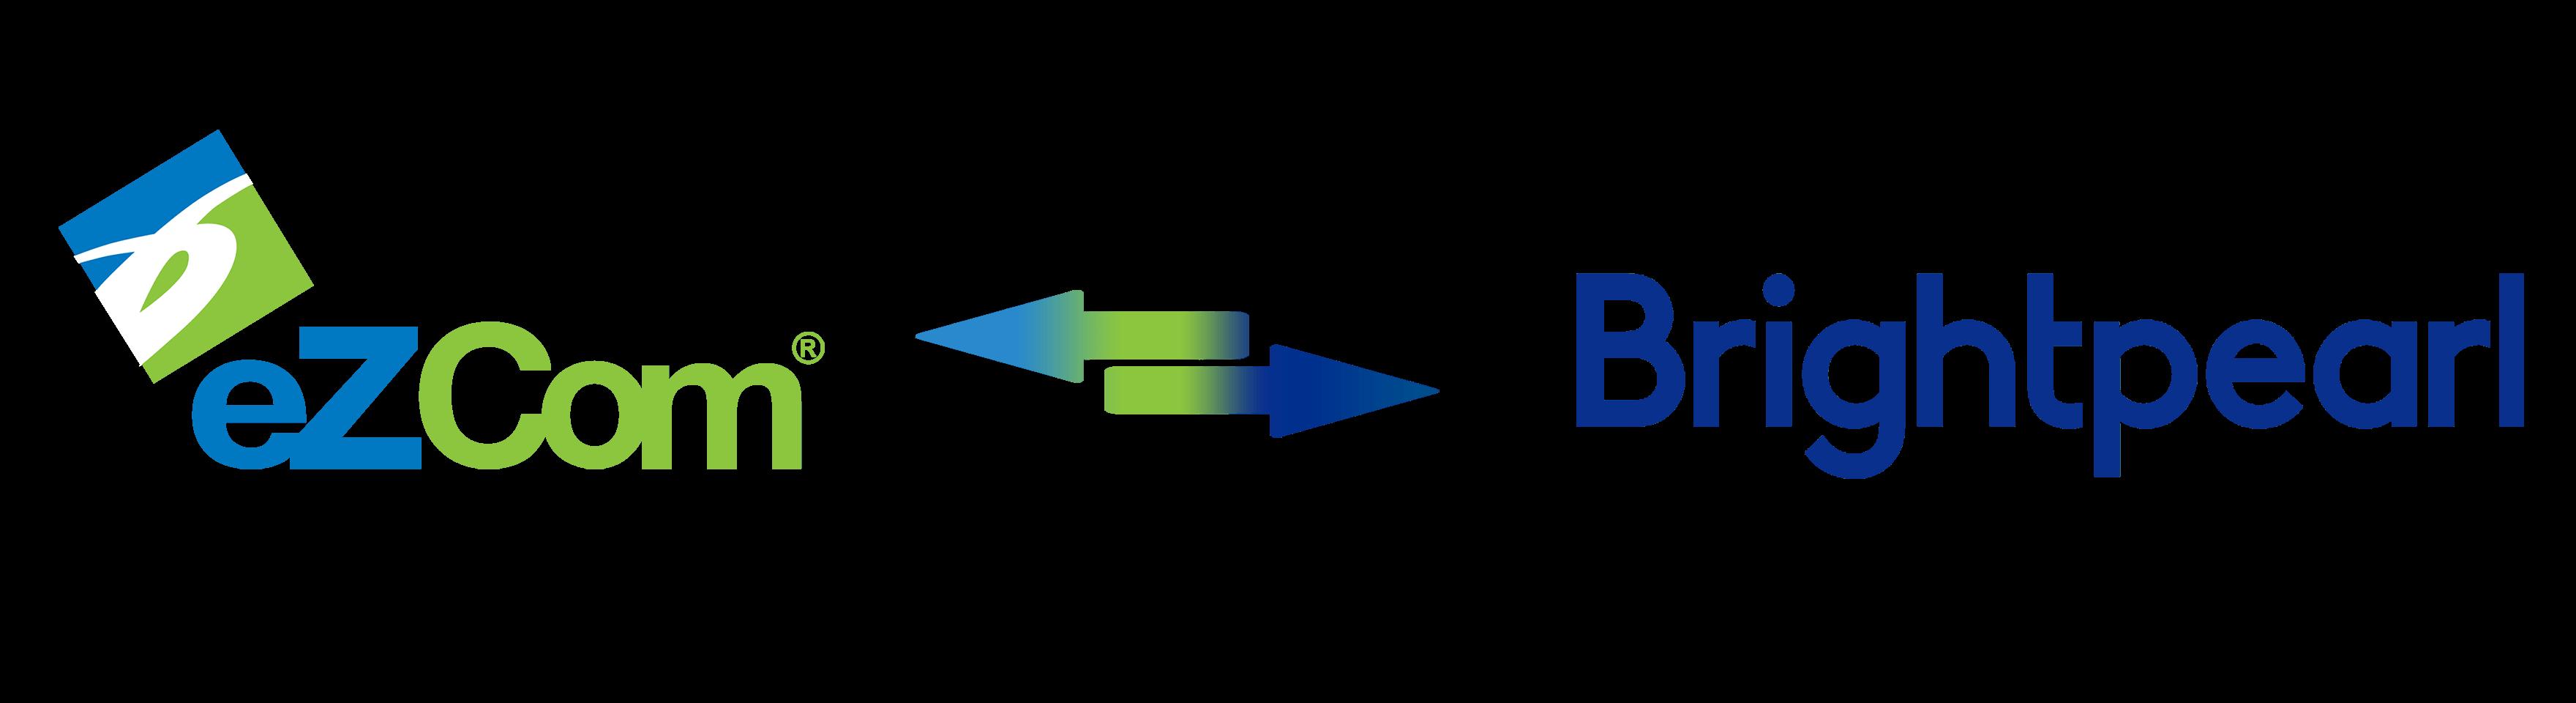 eZCom integrates with Brightpearl